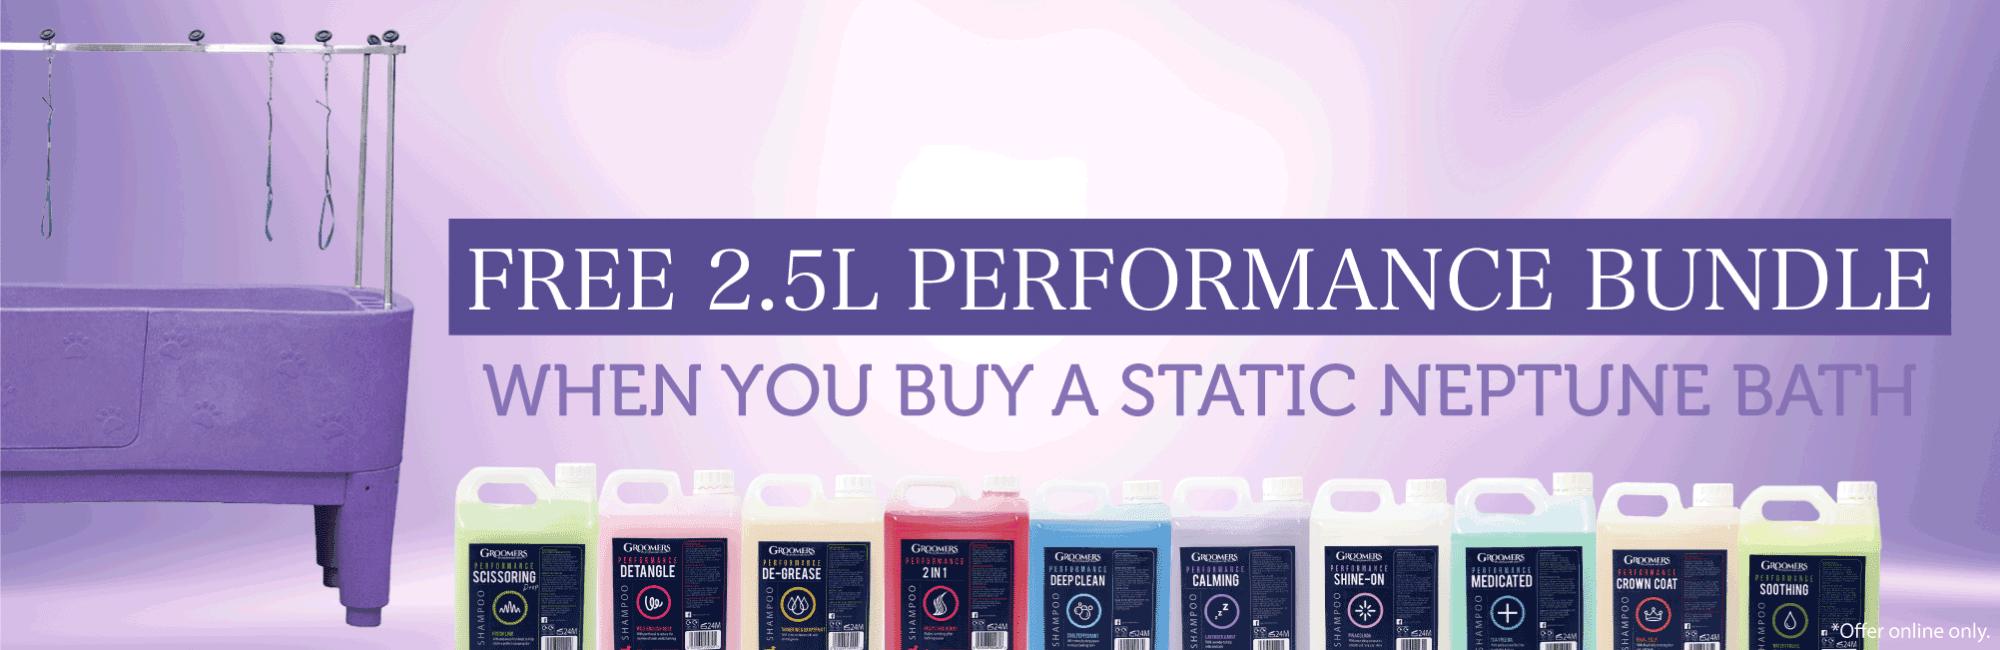 Free 2.5L Performance Bundle When You Buy a Static Neptune Bath